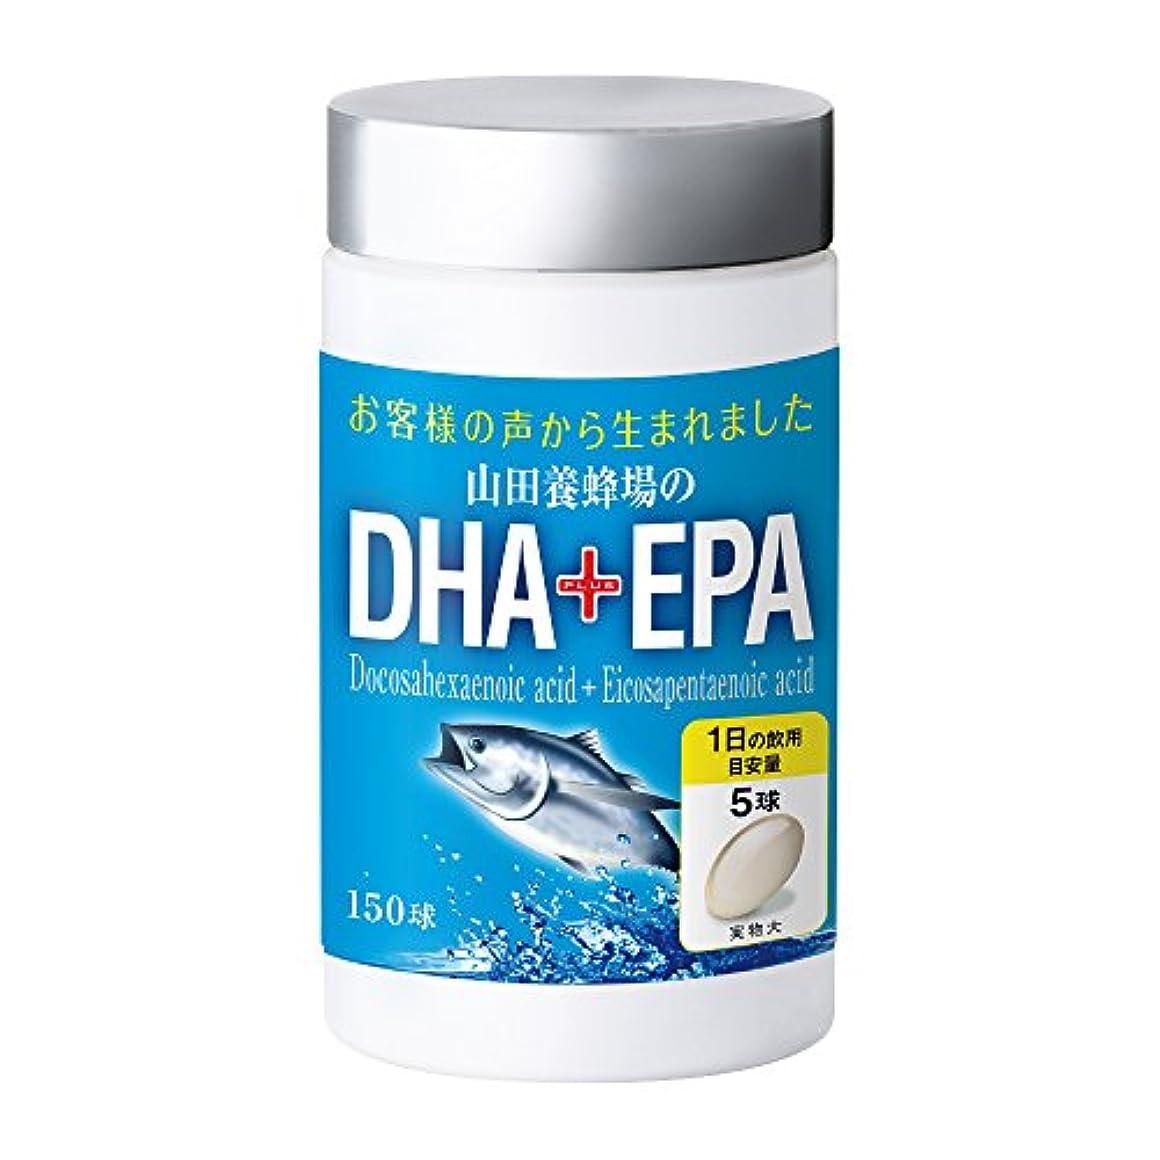 DHA+EPA 150球ボトル入/DHA+EPA <150 tablets>